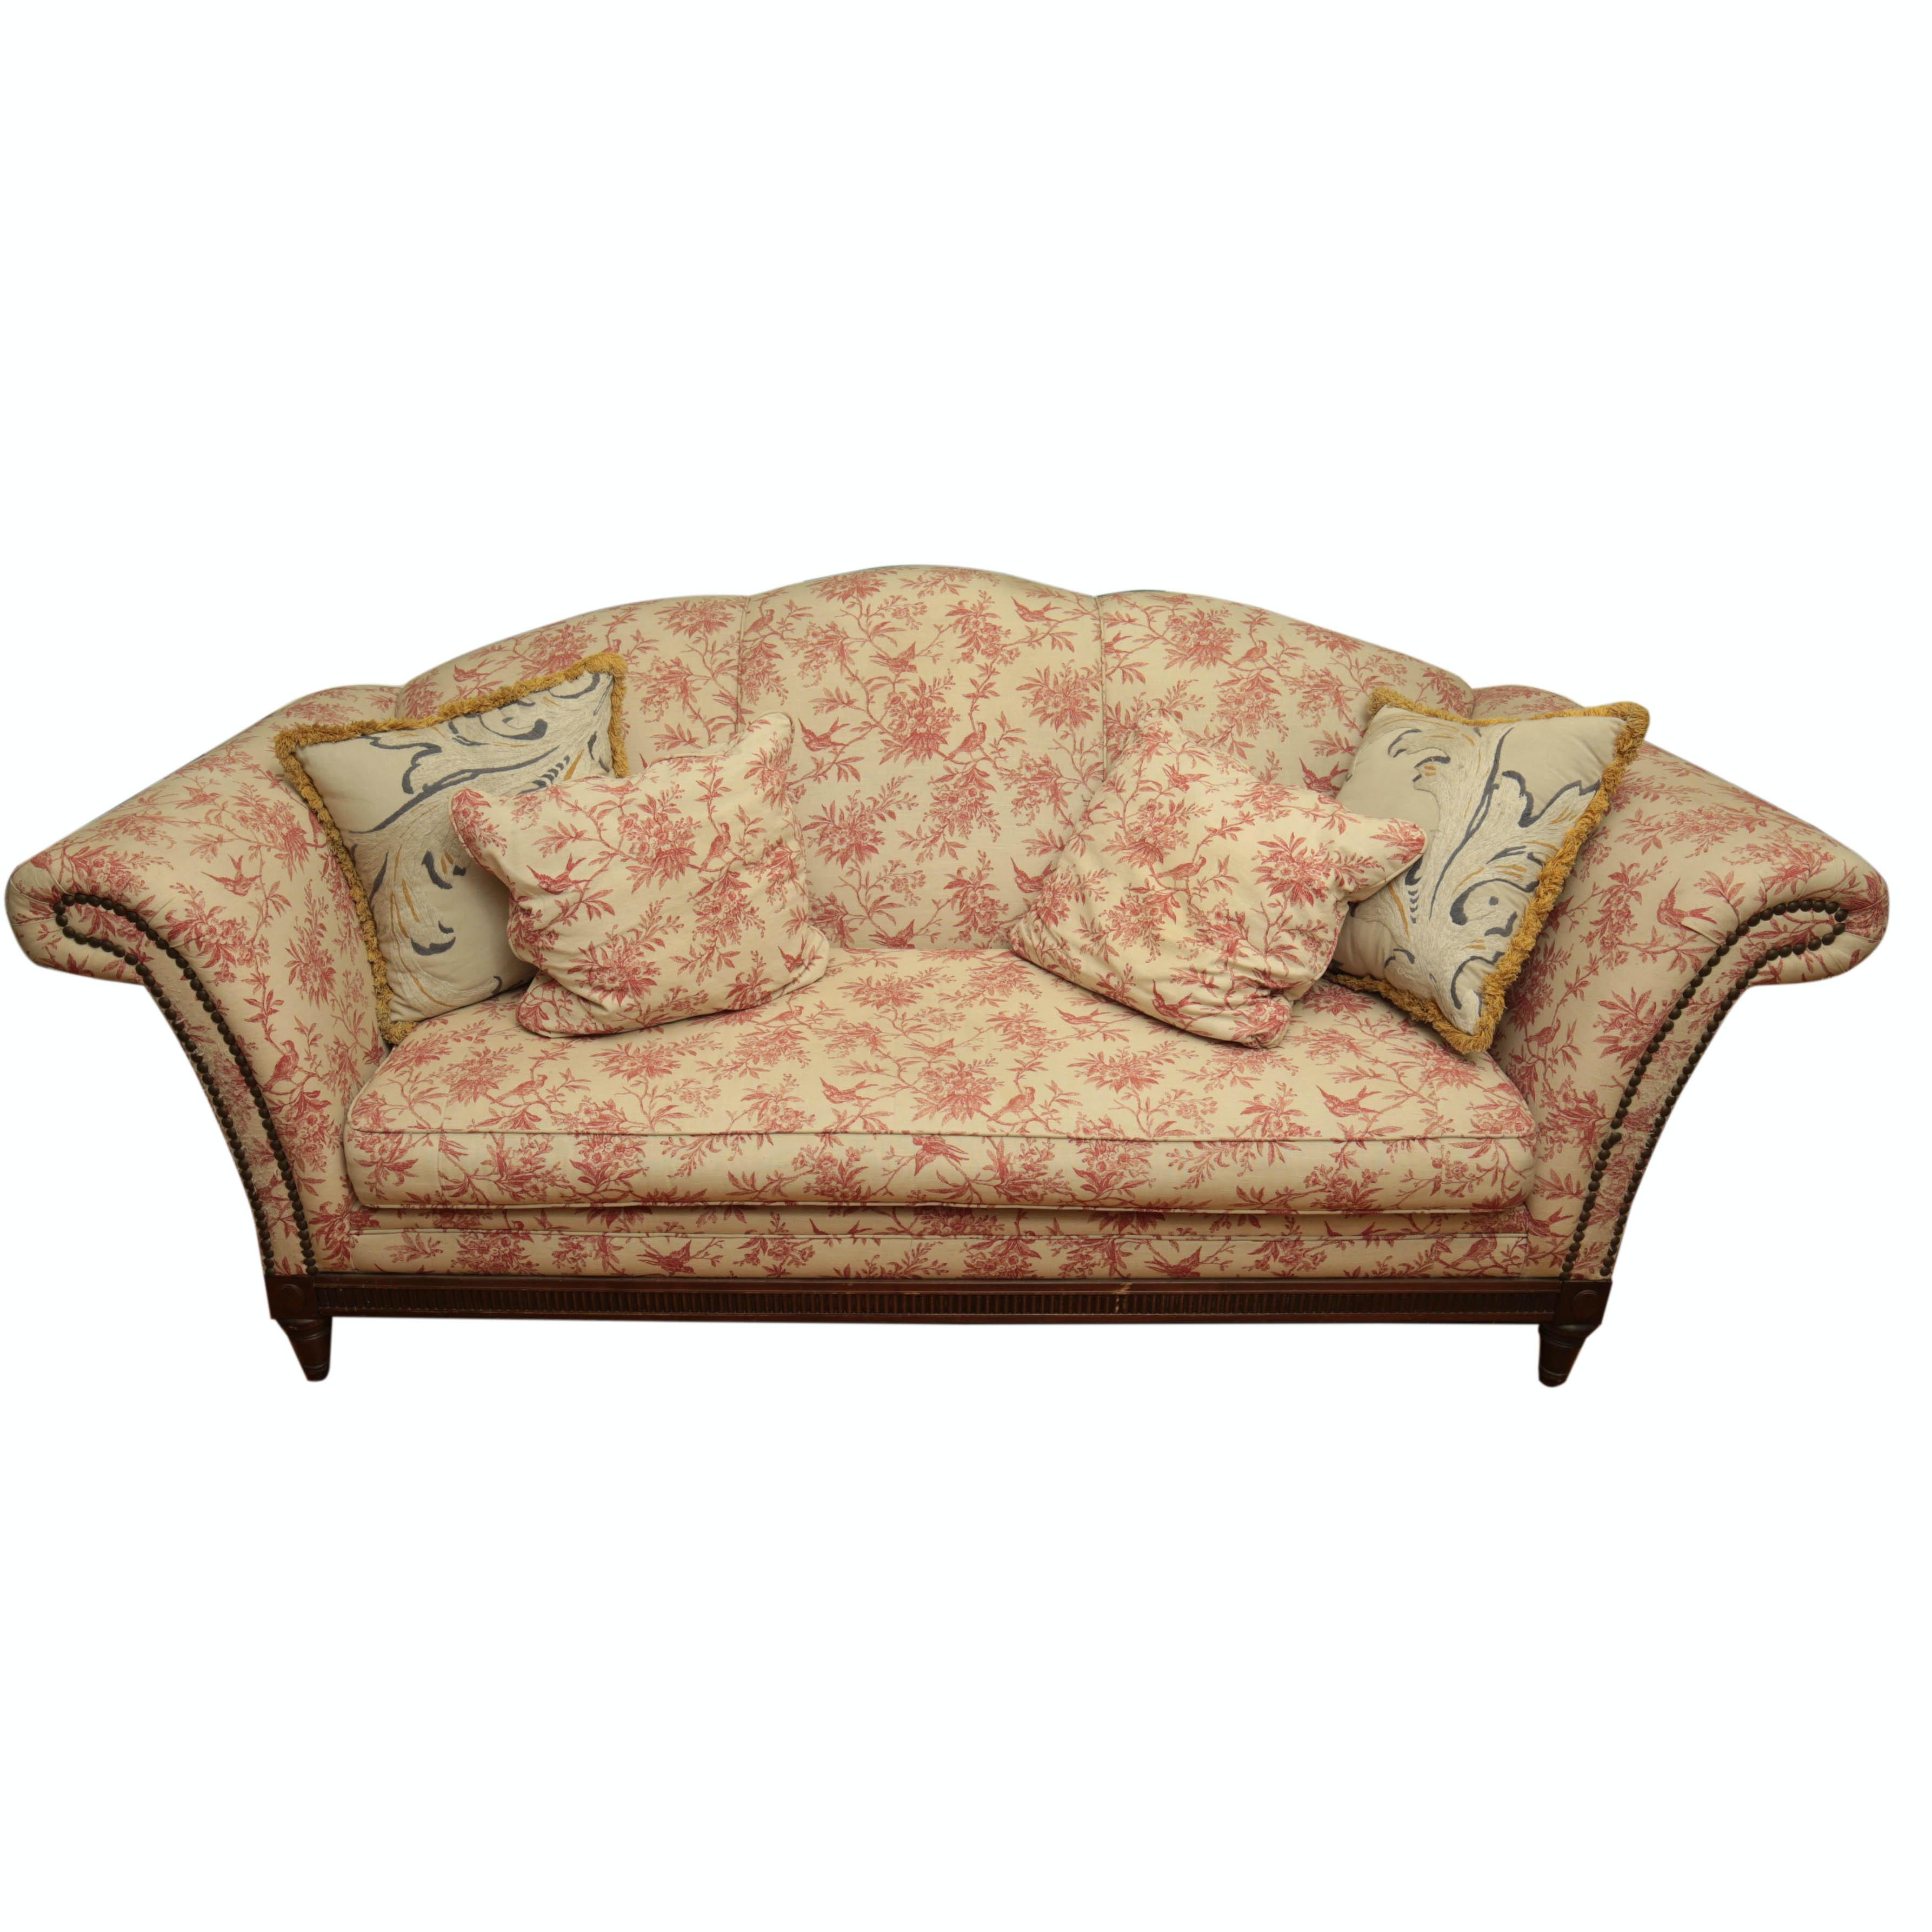 Bird Toile Upholstered Sofa By Plunkett Furniture ...